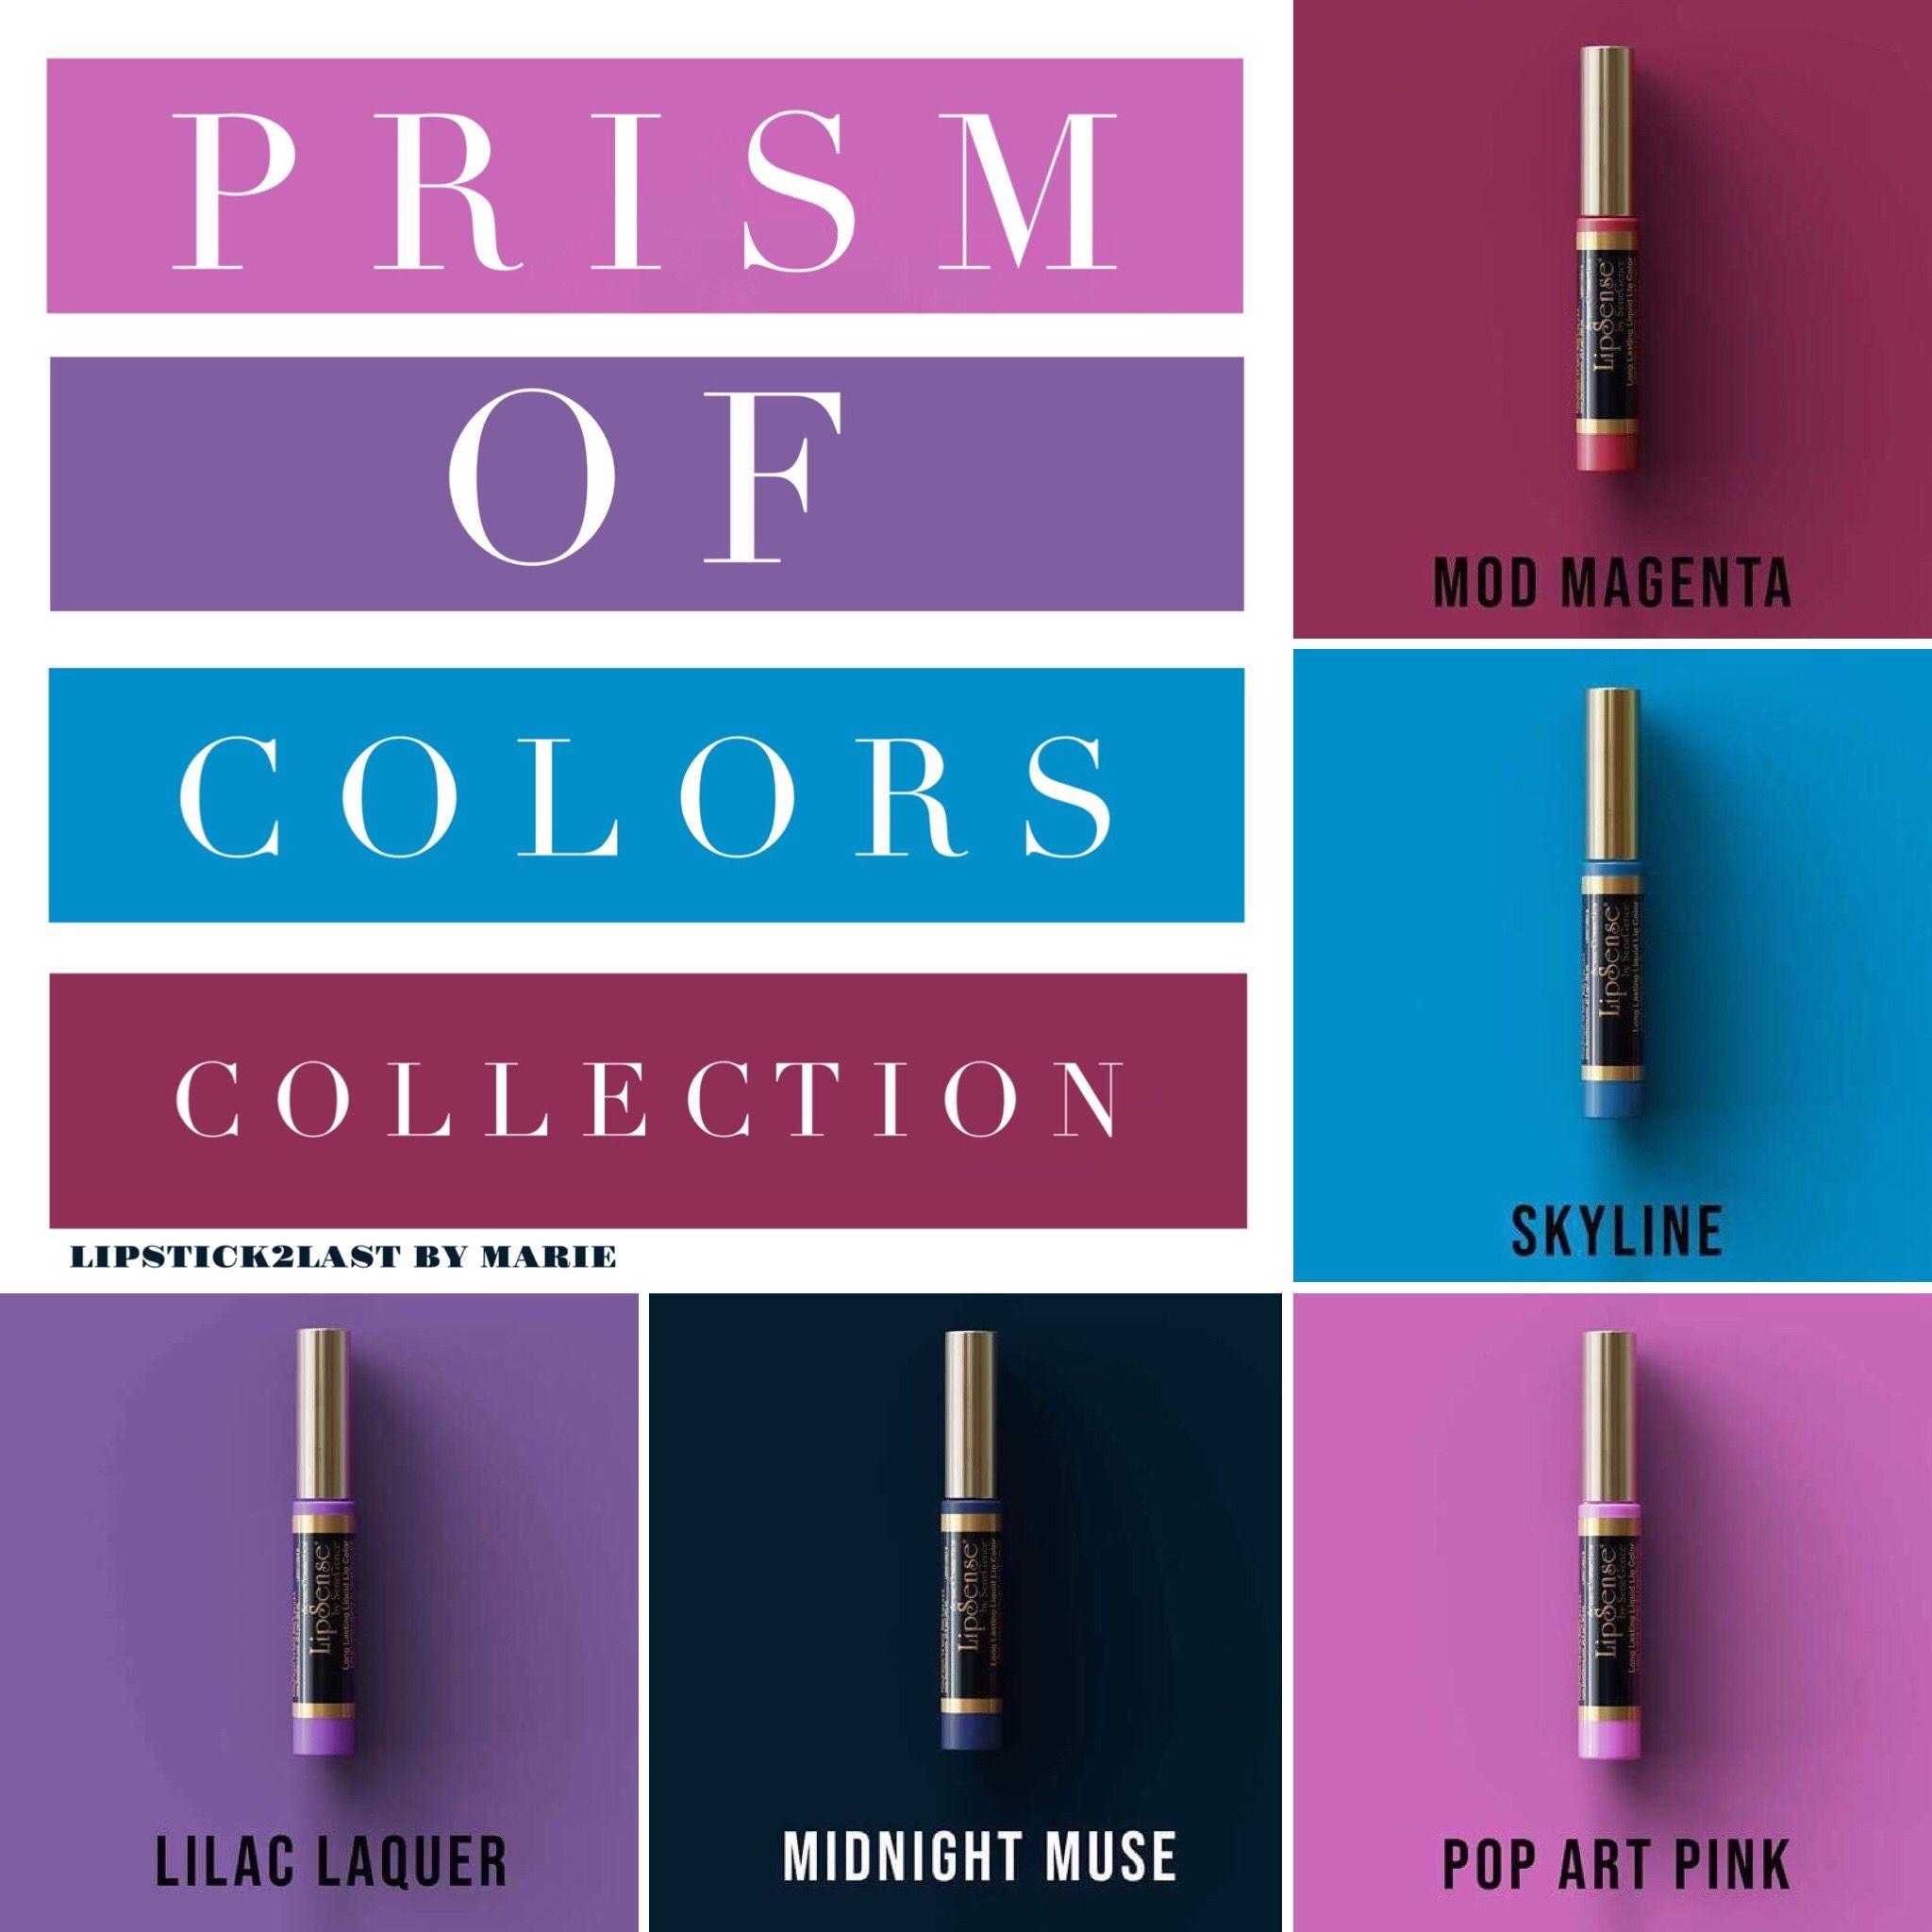 5 new LipSense colors!!! The Prism of Colors Collection. Mod Magenta LipSense & 5 new LipSense colors!!! The Prism of Colors Collection. Mod Magenta ...